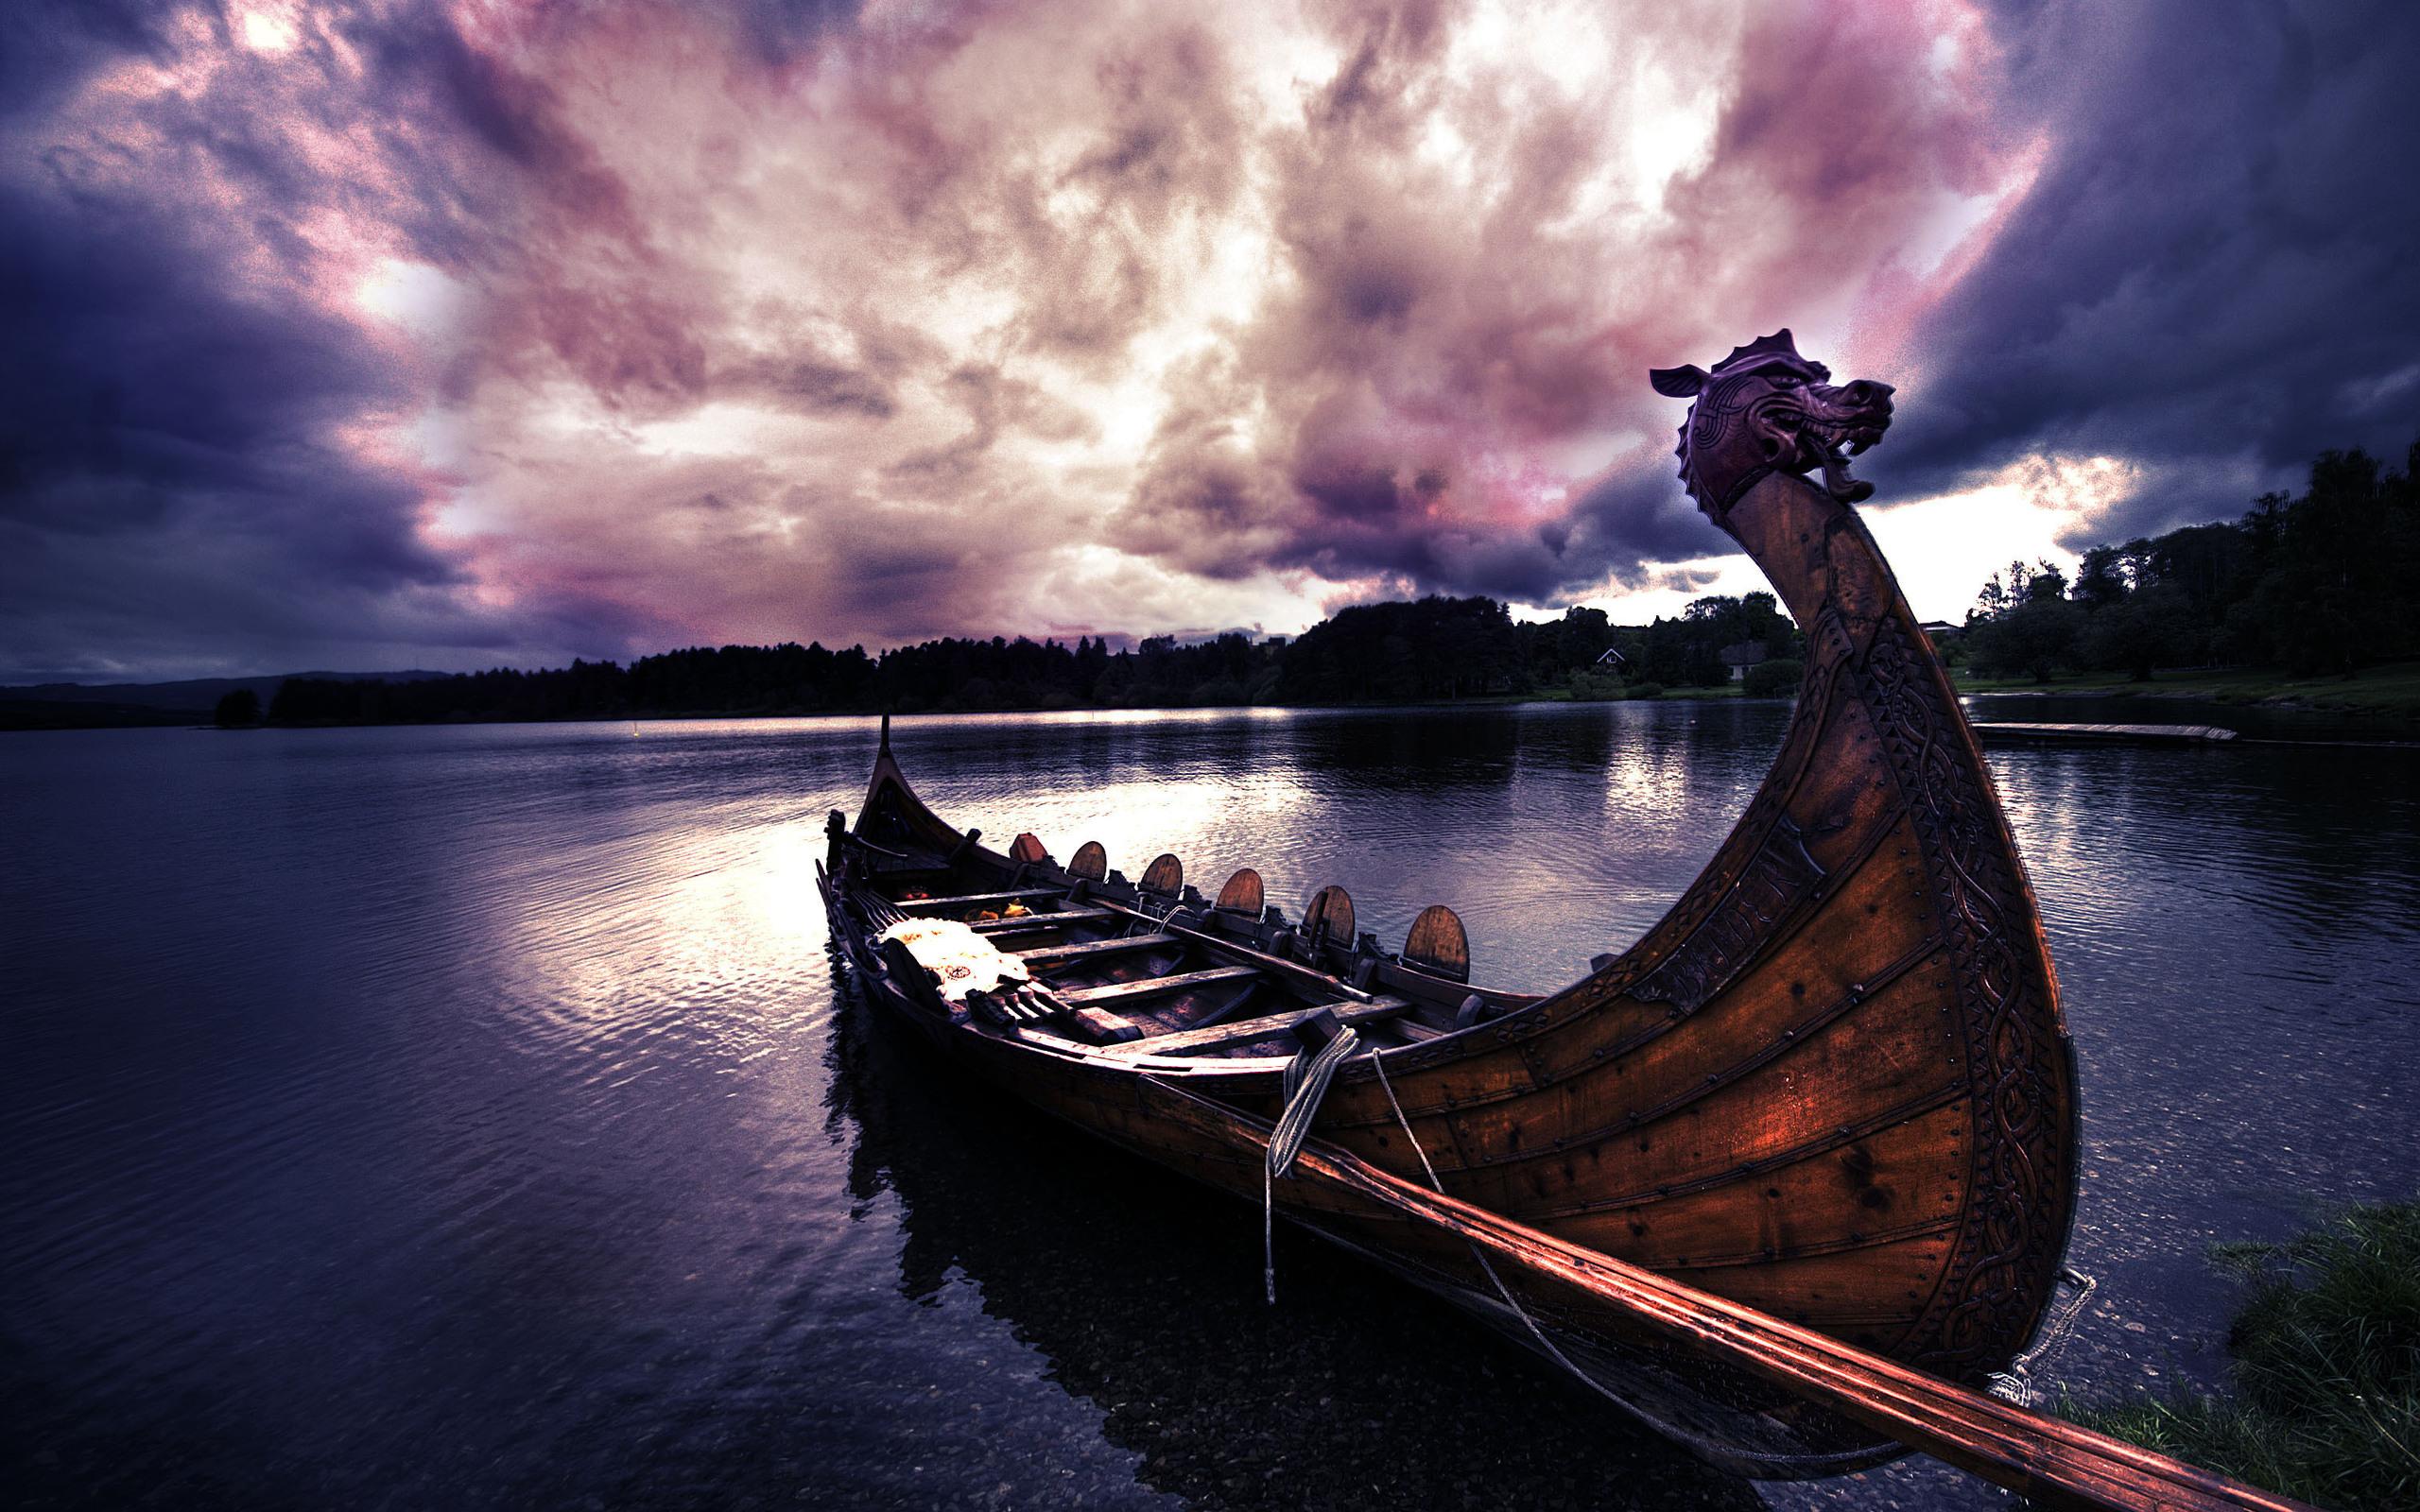 Viking Boat Wallpaper 2560x1600 Wallpapers 3d for desktop 3d 2560x1600